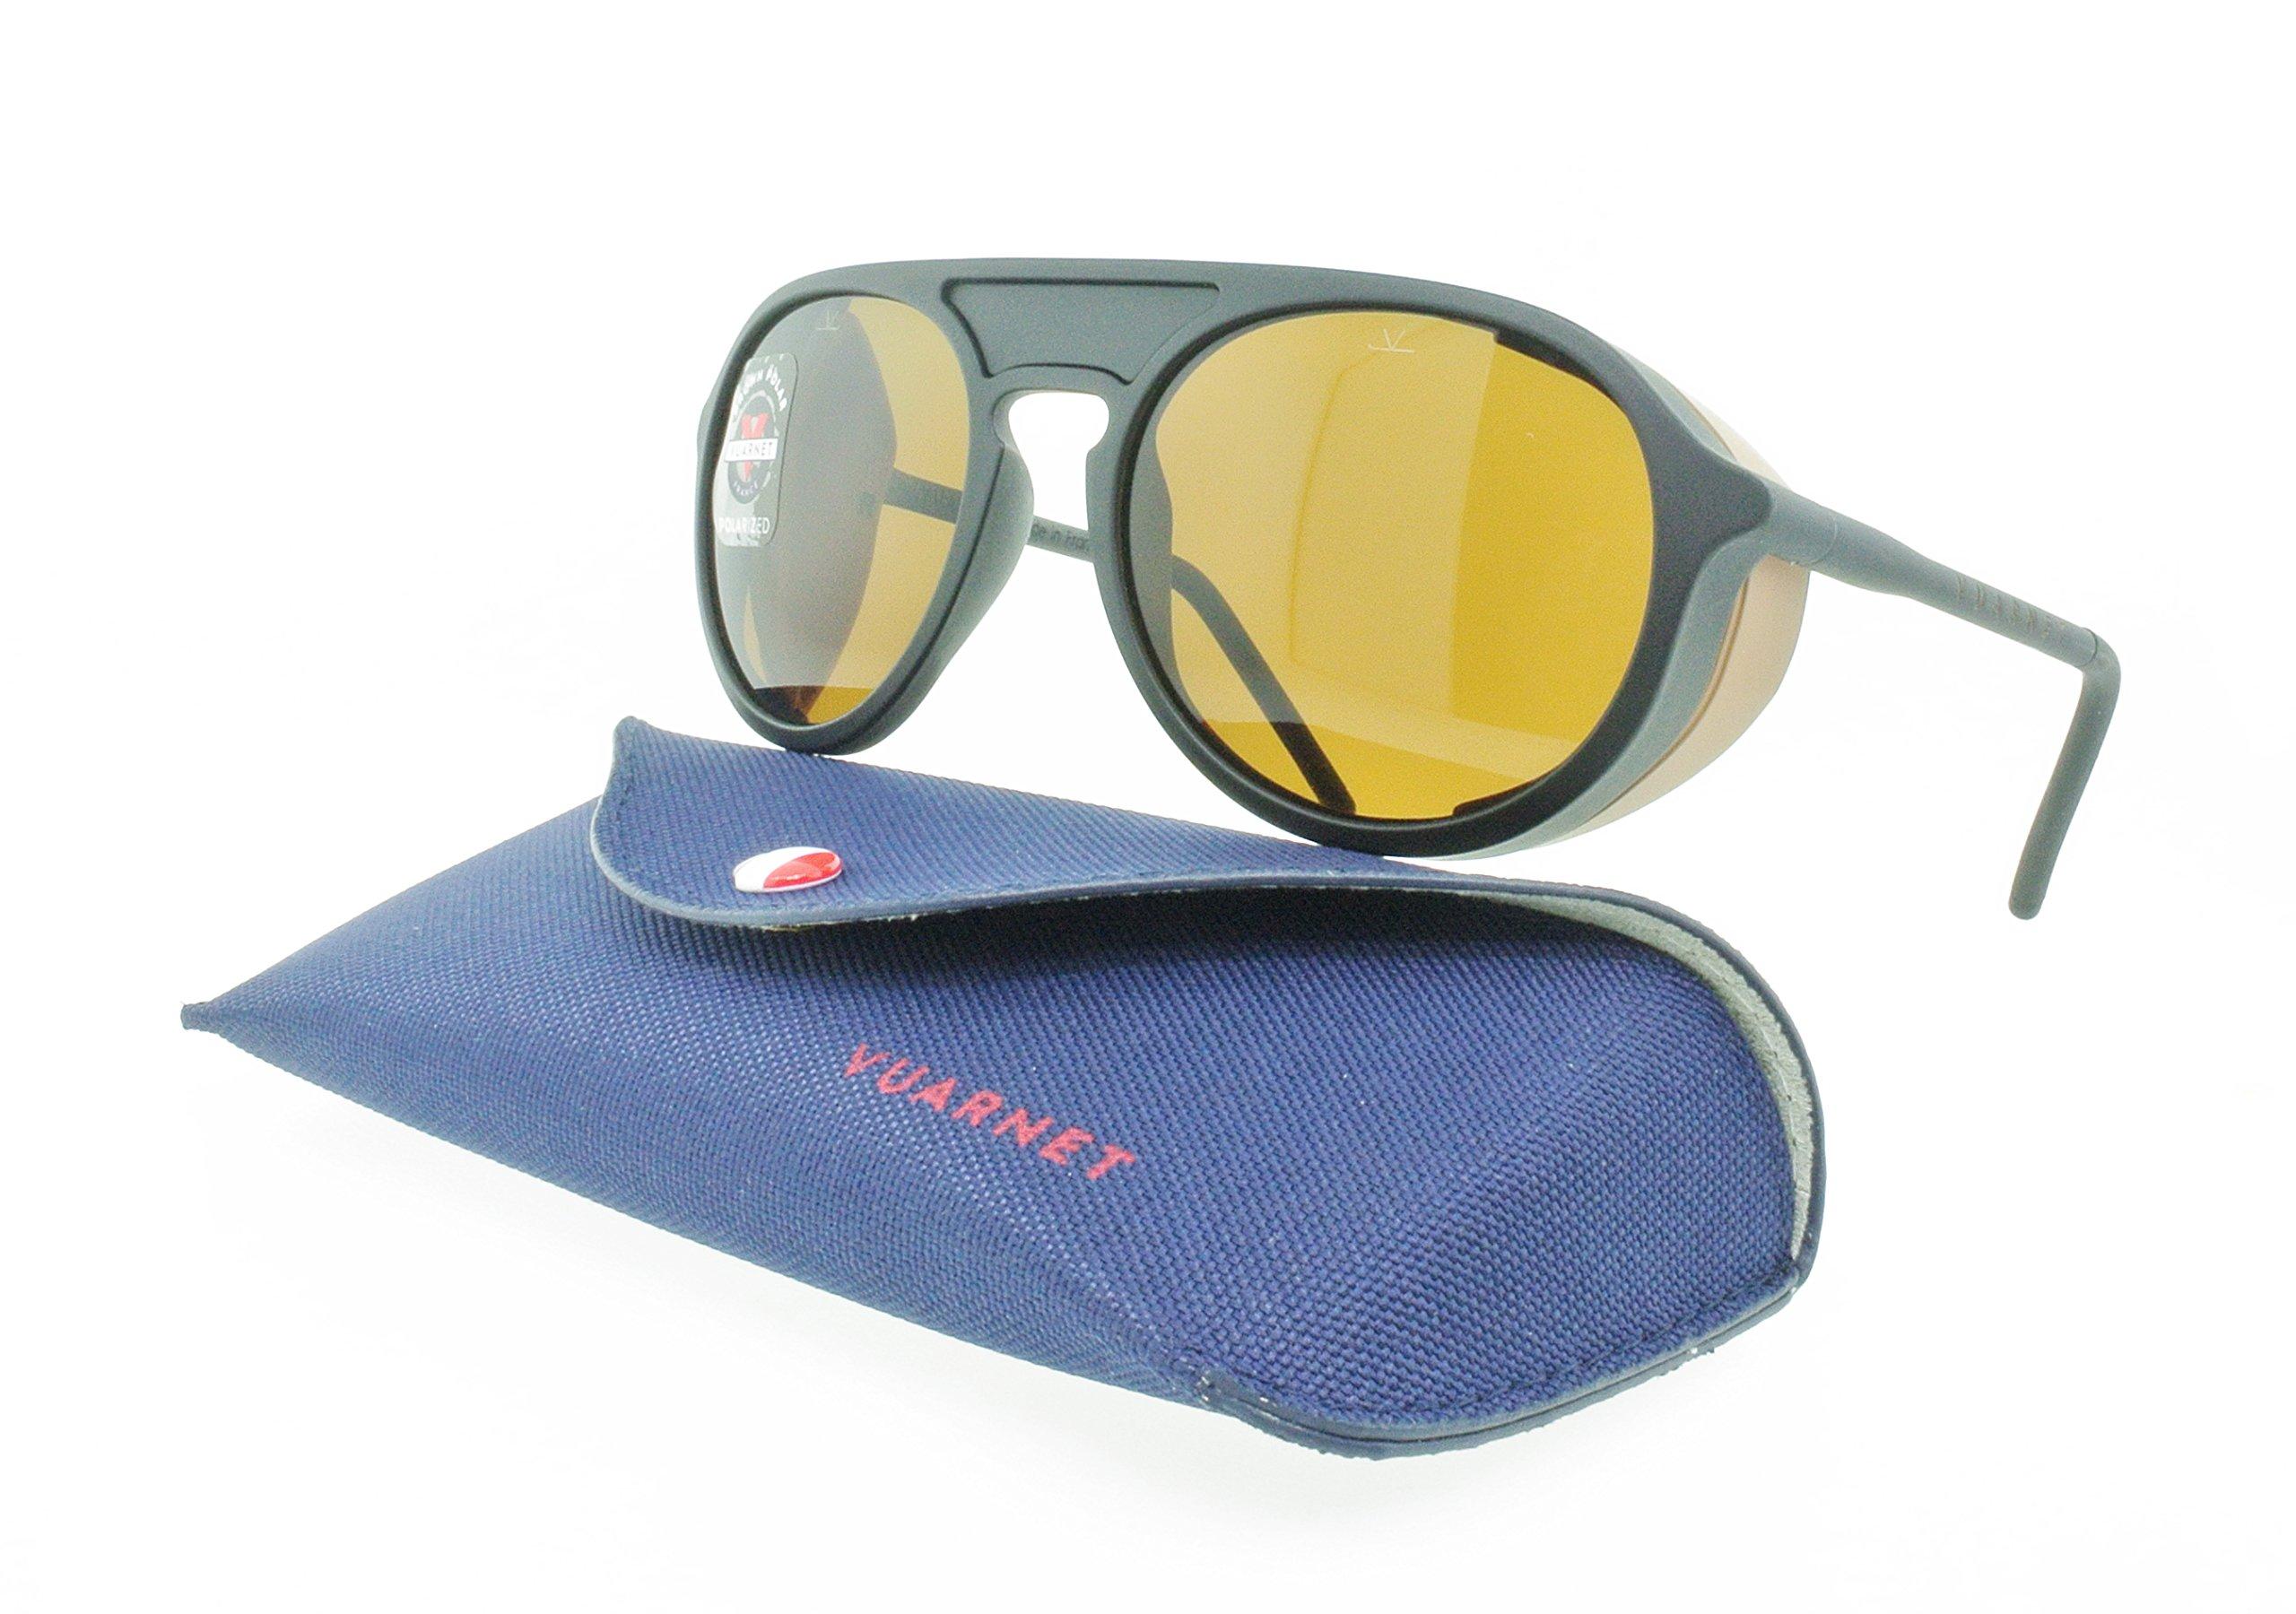 Brand New Authentic Vuarnet Aviator Sunglasses 1709 0002 2622 Black / Brown Polarized